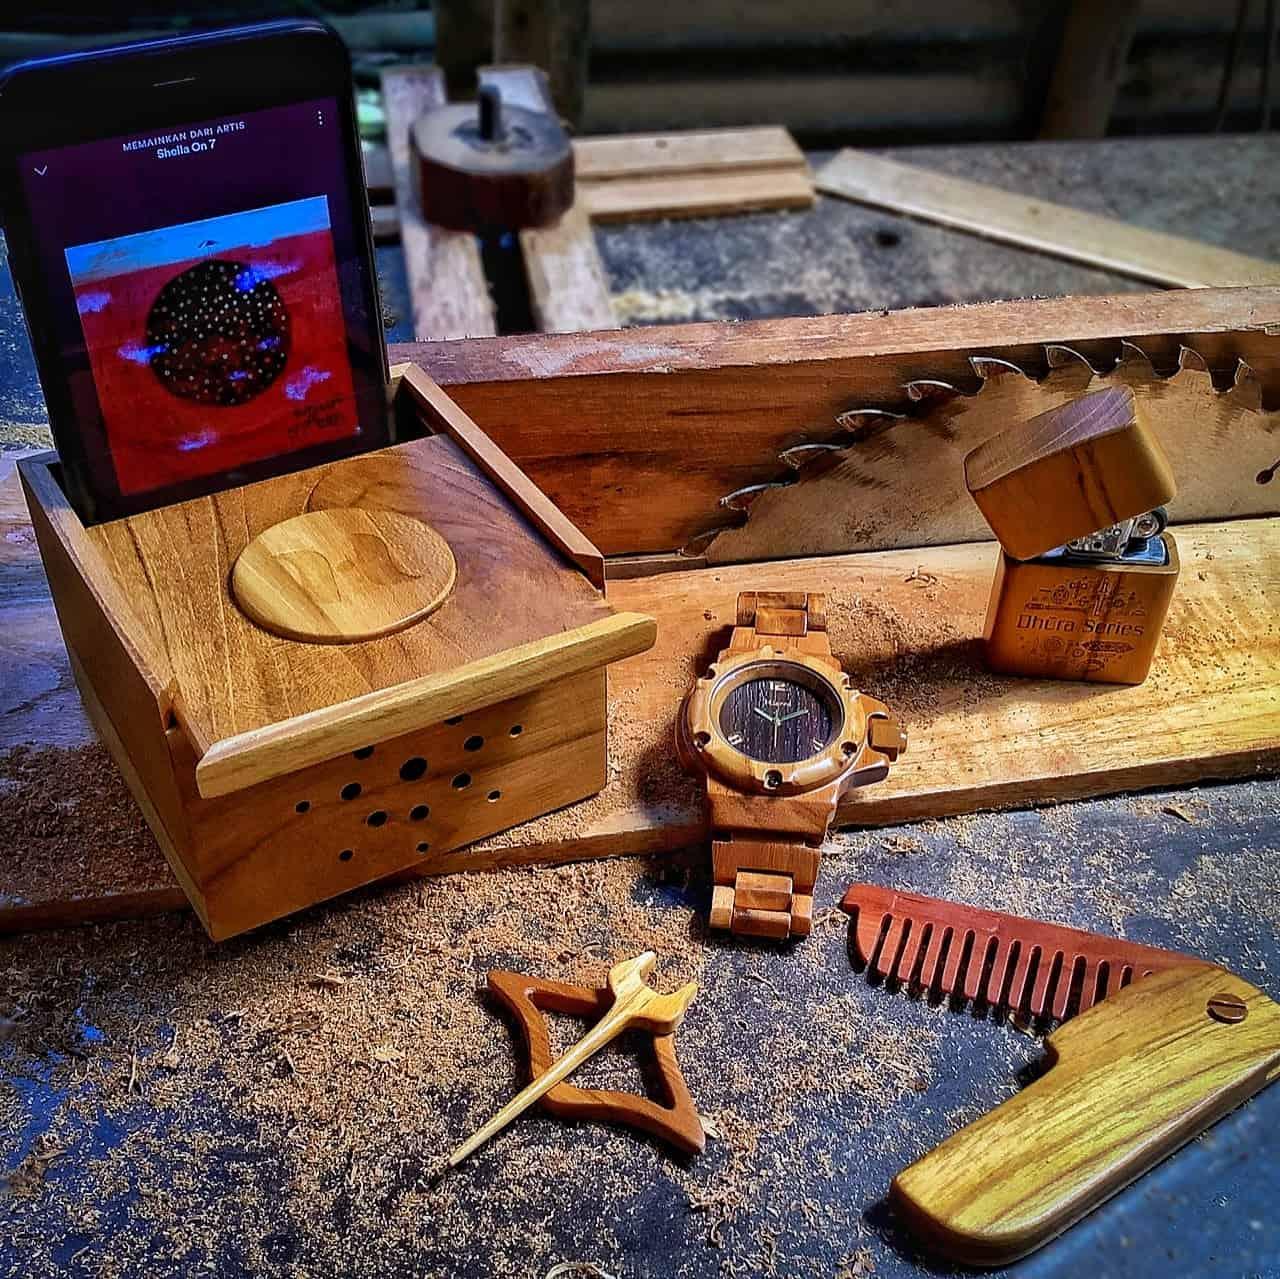 Hierro Watch Jam tangan kayu jogja